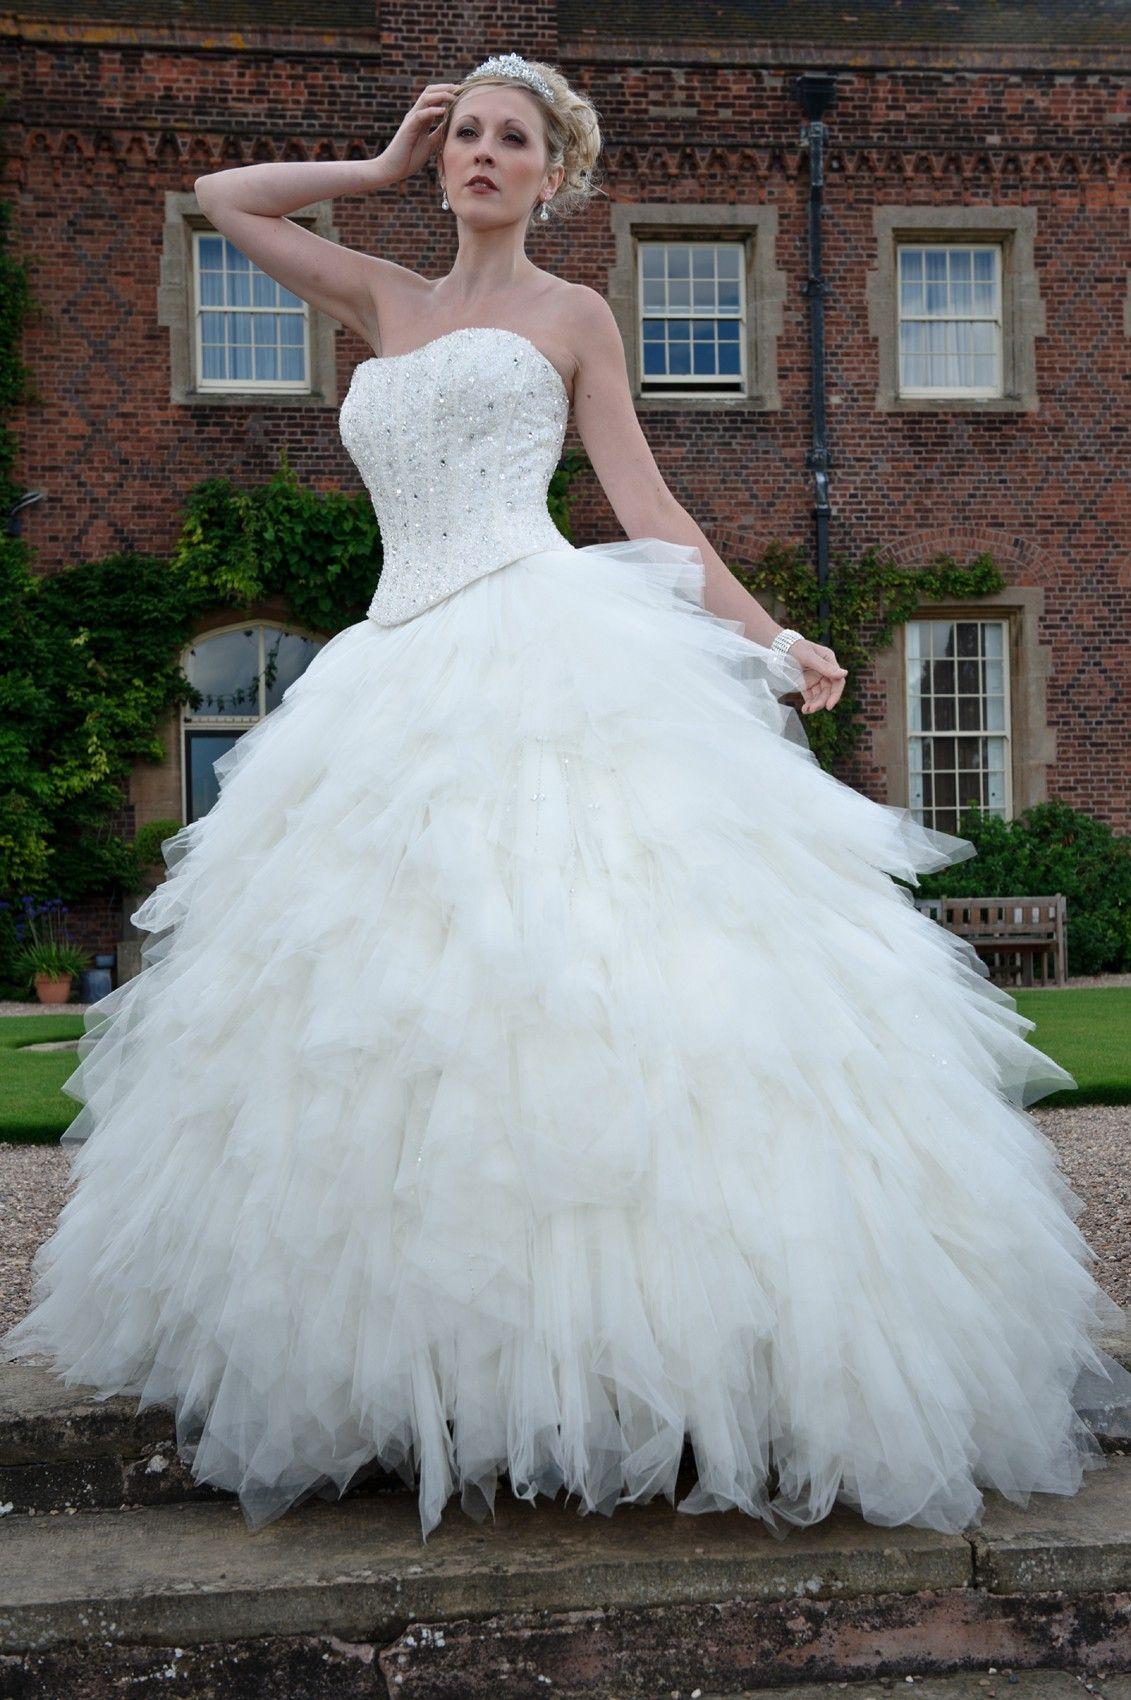 2016 Luxury Hollywood Princess Wedding Dresses Strapless